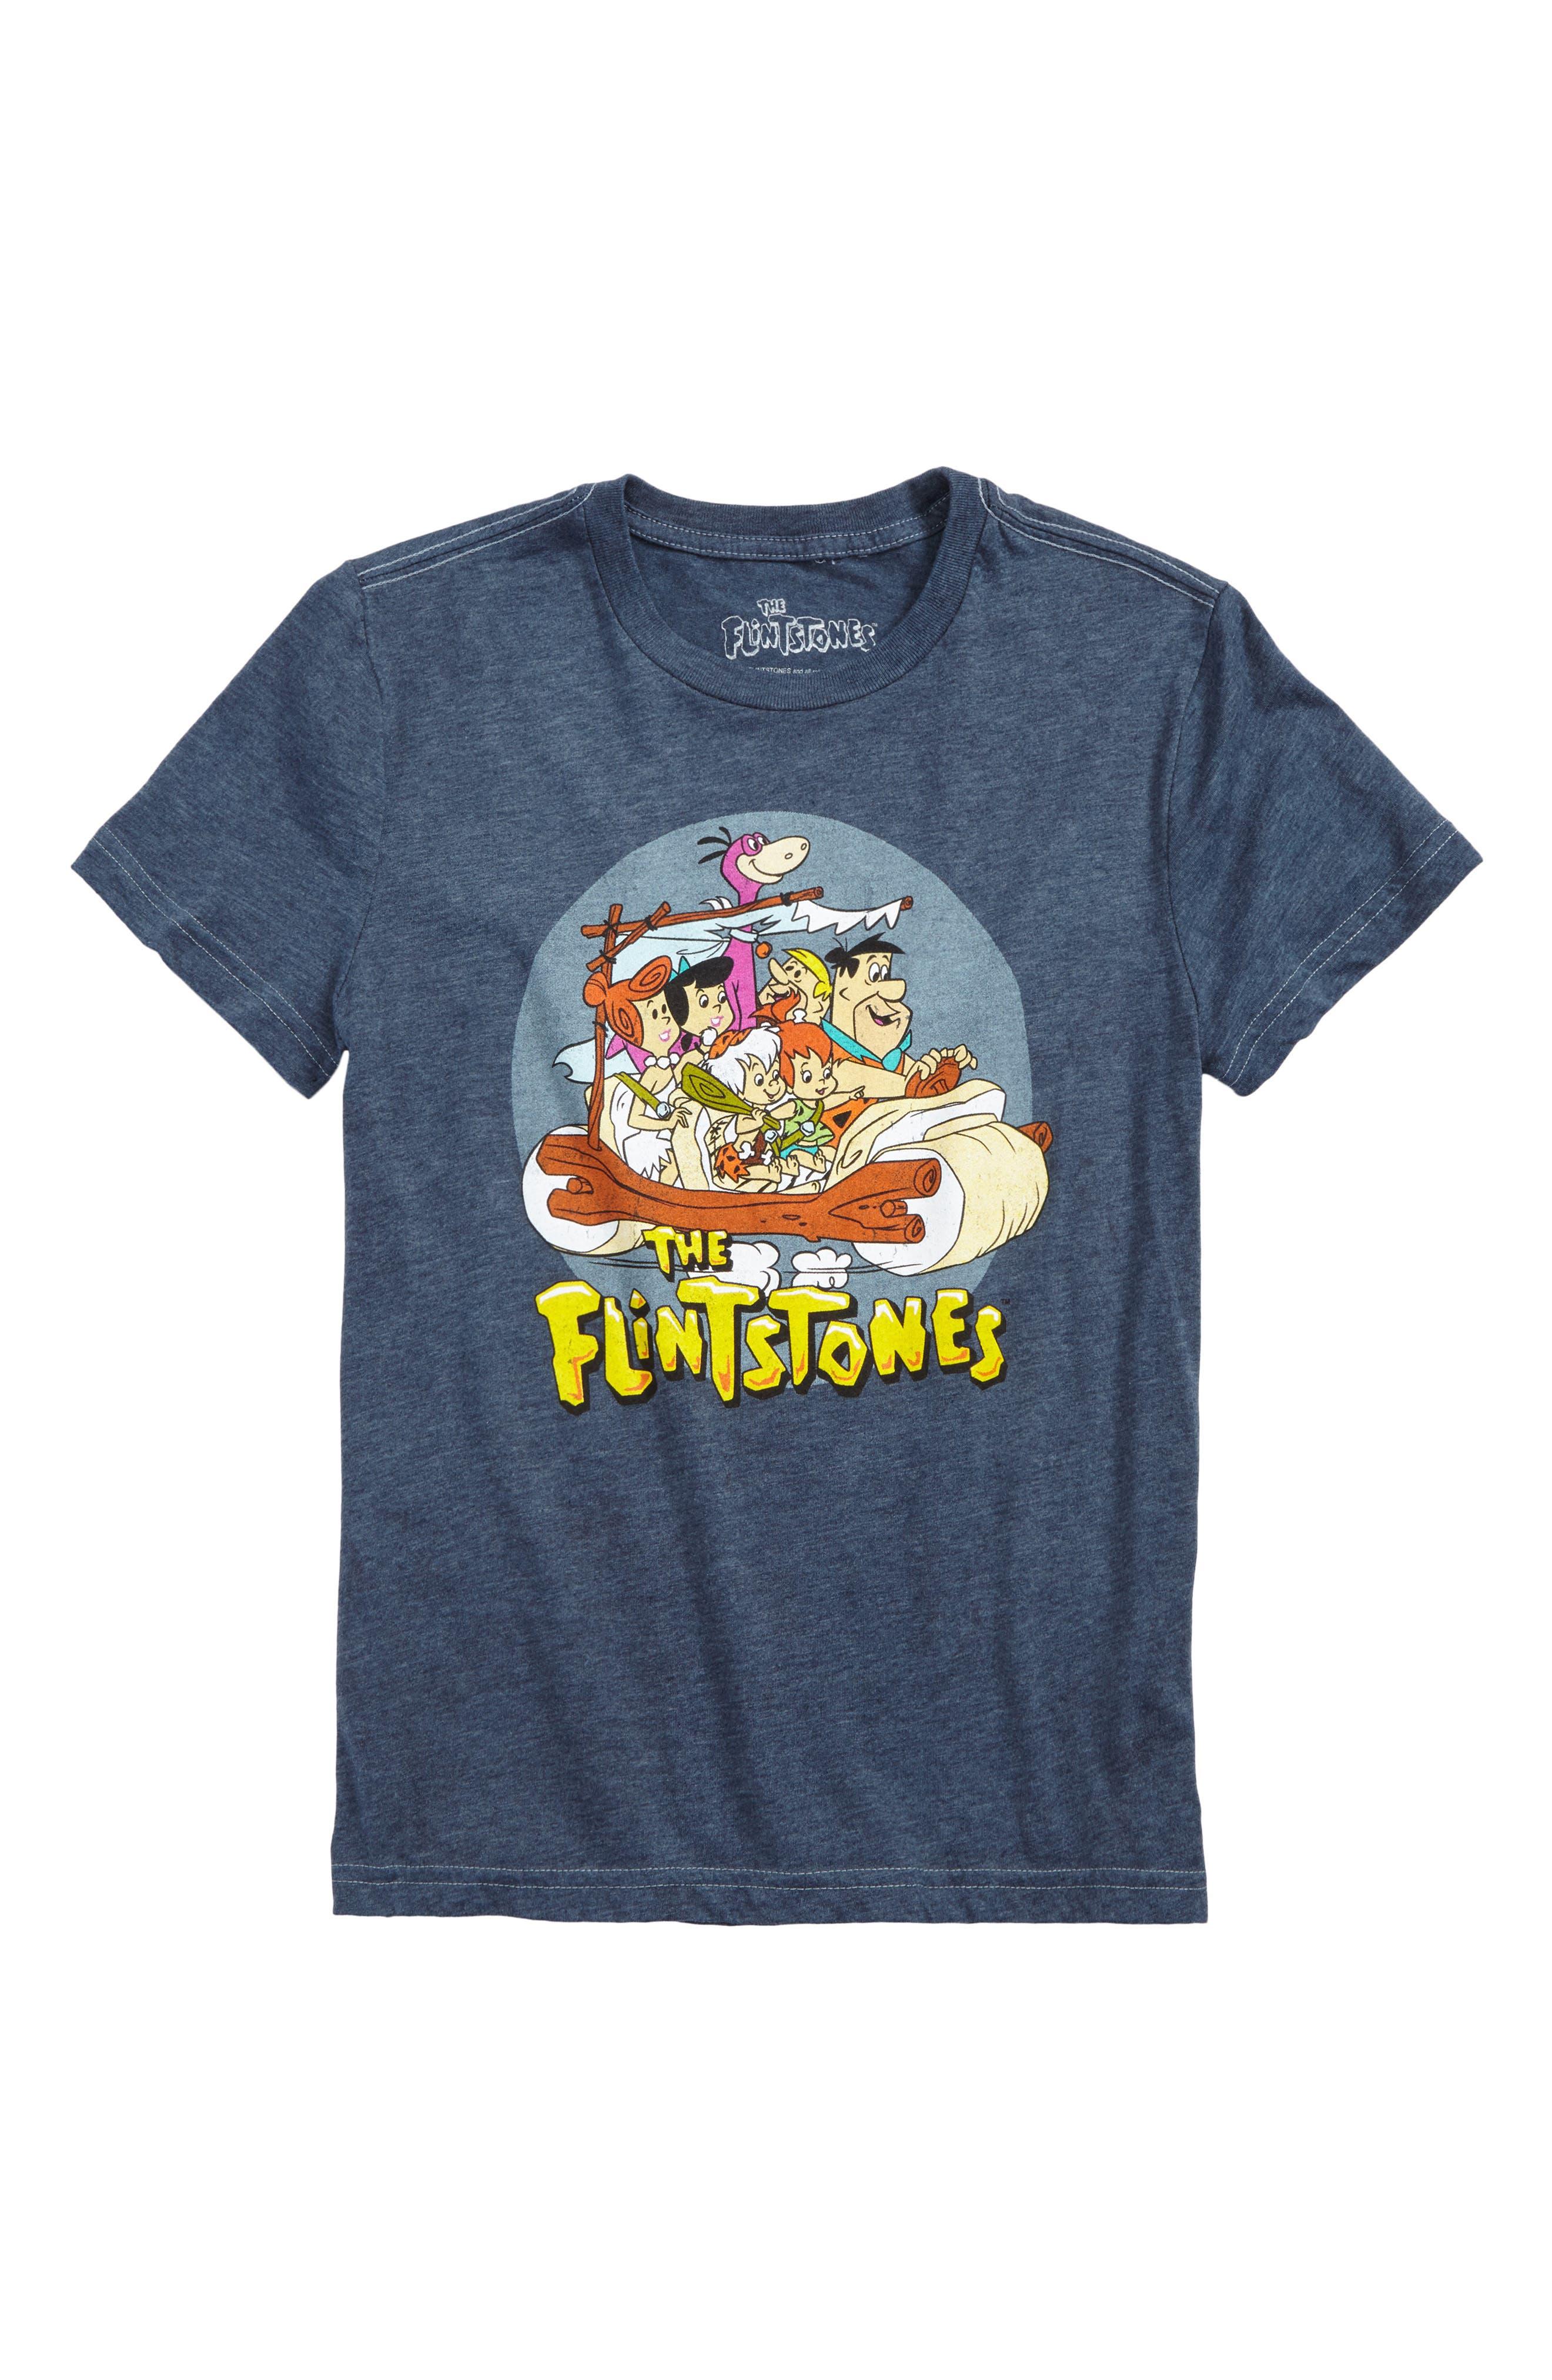 Alternate Image 1 Selected - Jem Flintstones Family Graphic T-Shirt (Big Boys)